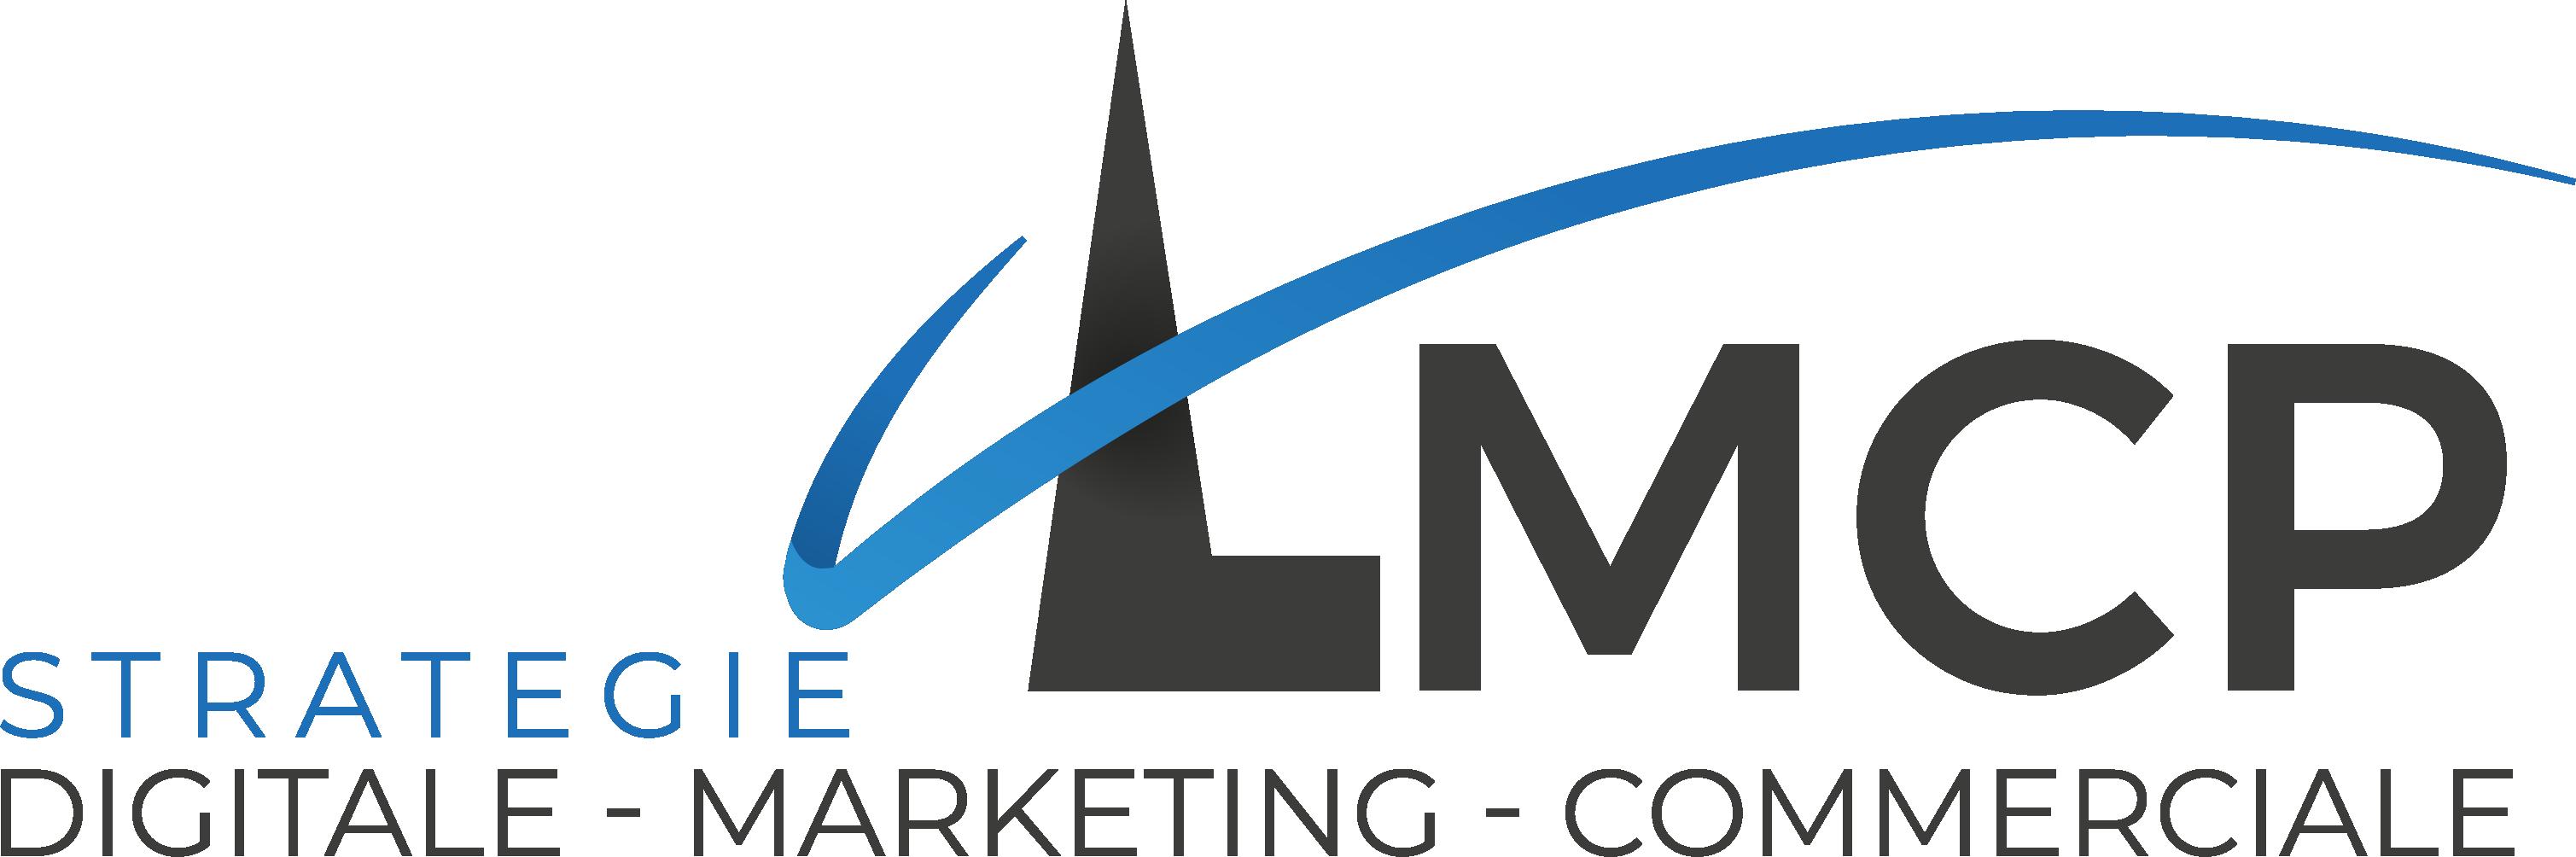 LMCP-logo-300dpi